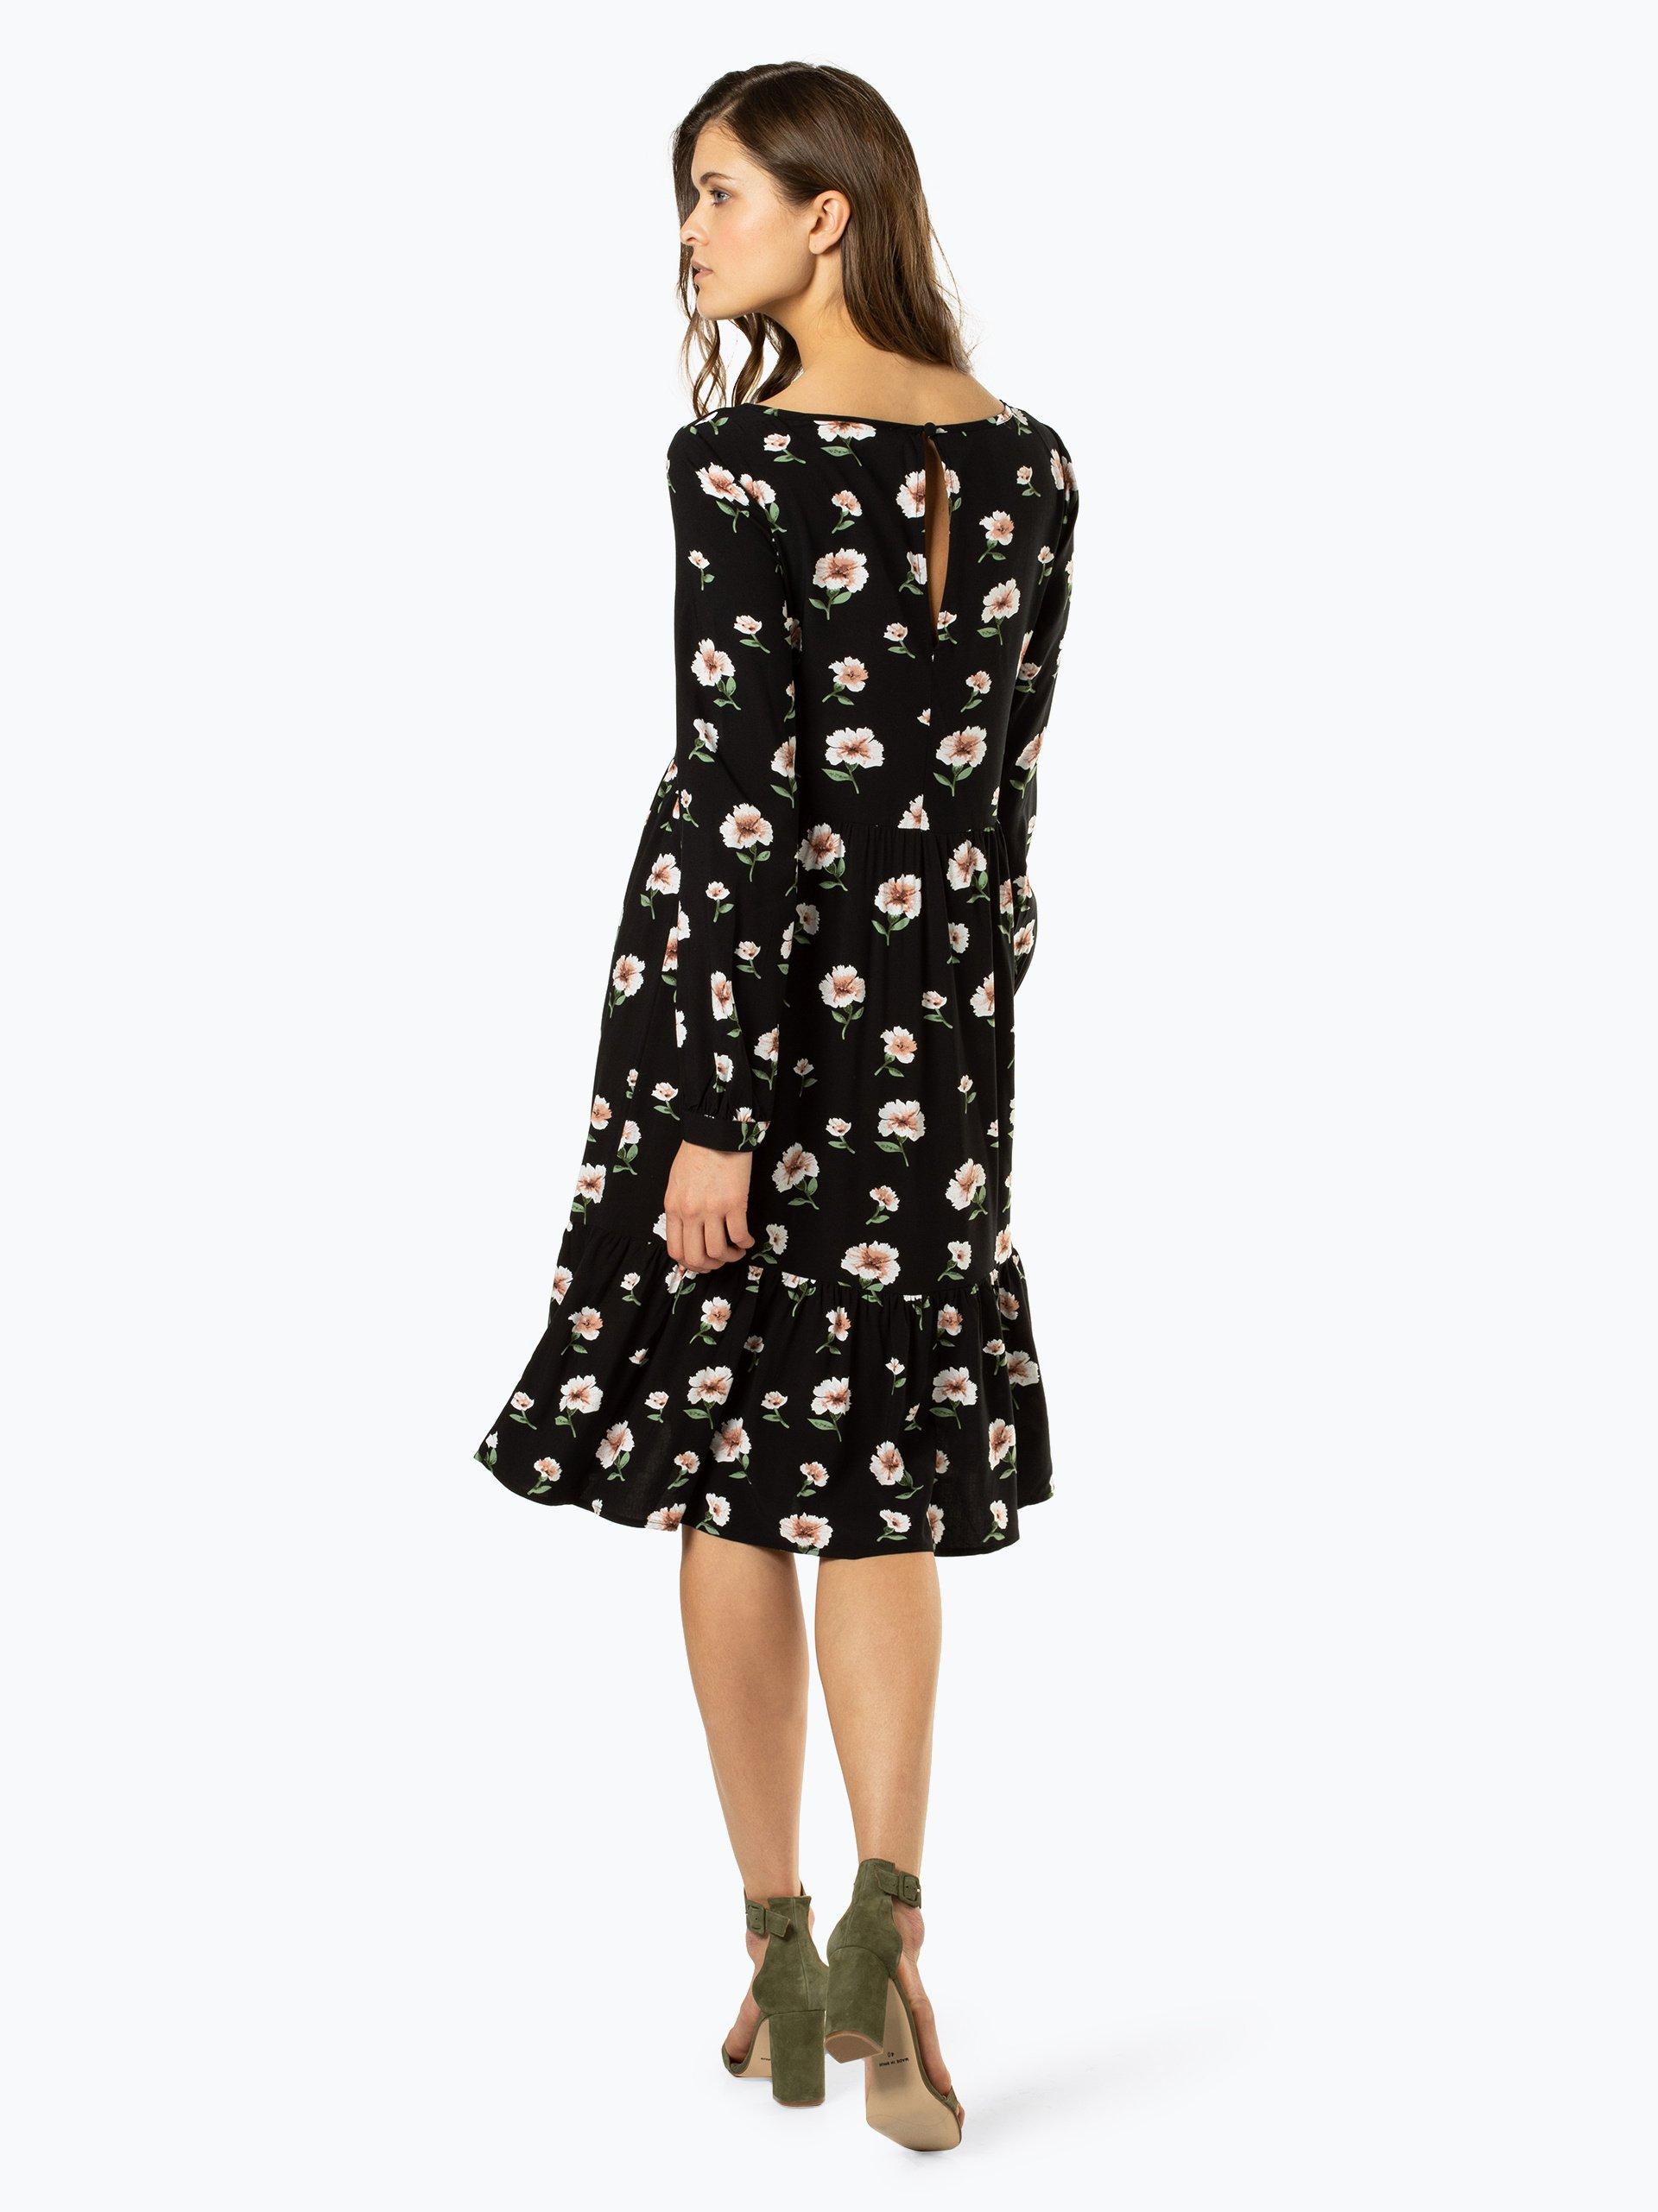 Vila Damen Kleid - Vicarrara online kaufen | PEEK-UND ...